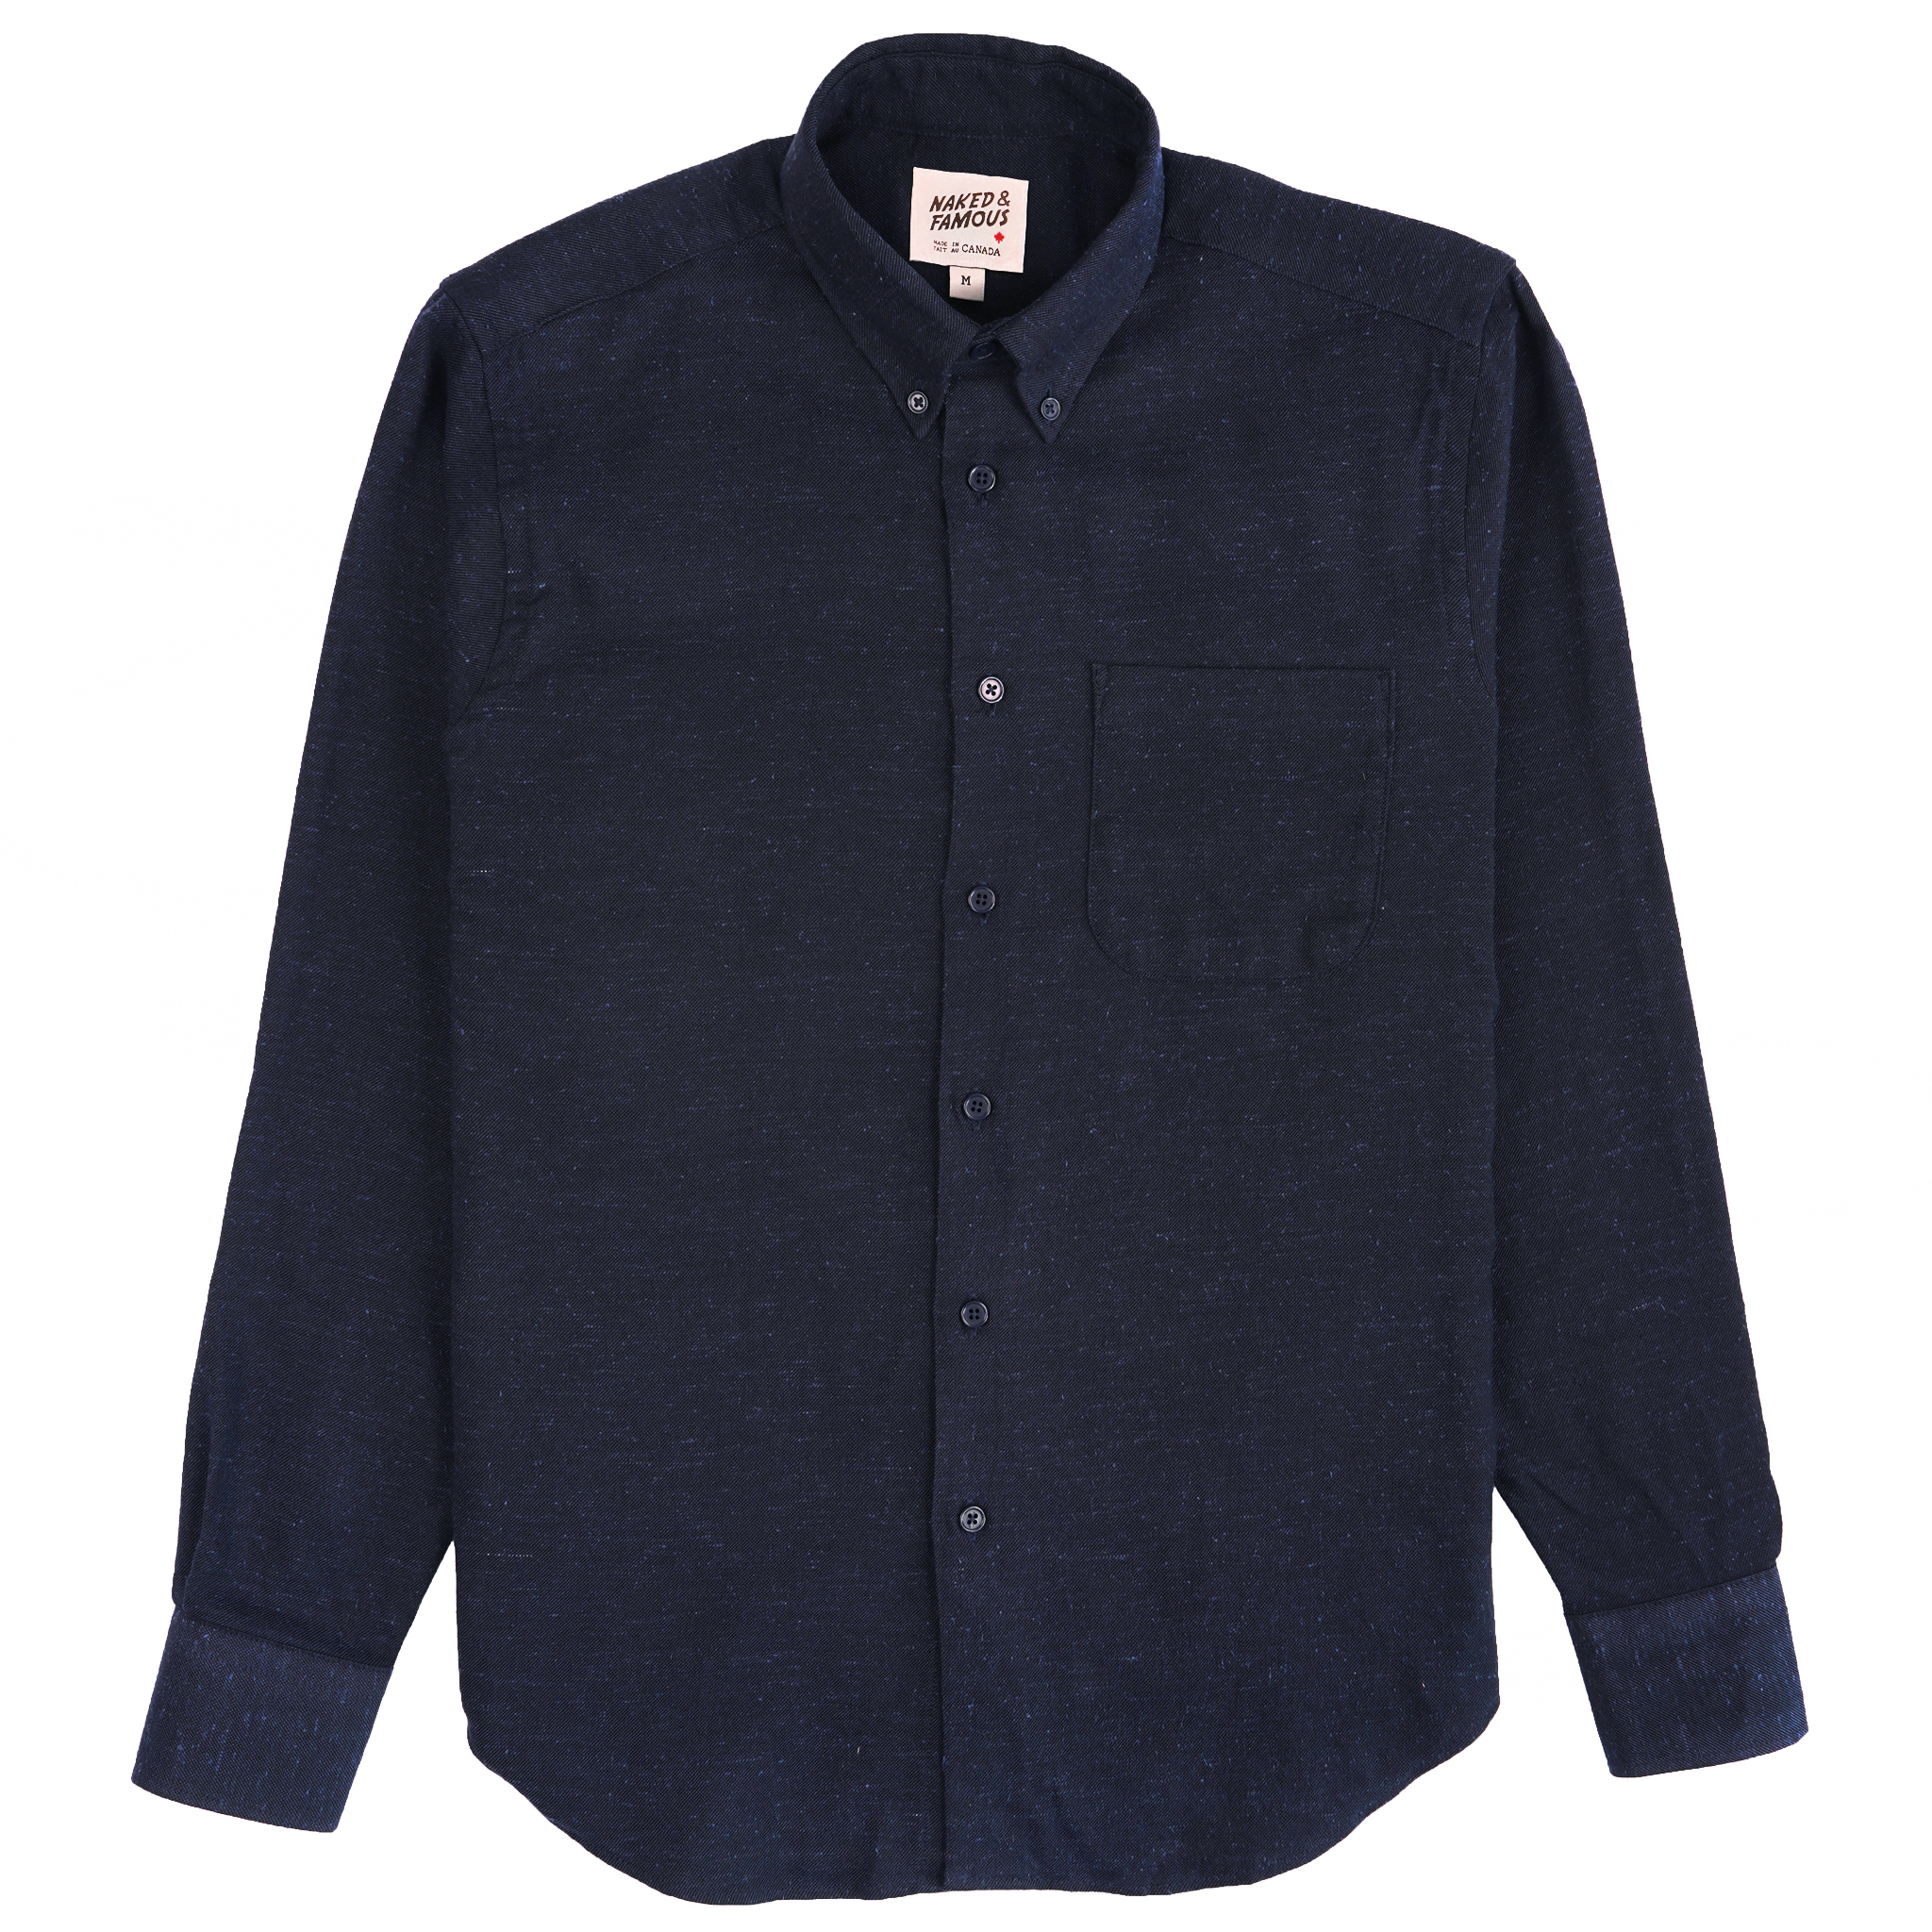 Silk Blend Nep Twill - Navy - Easy Shirt